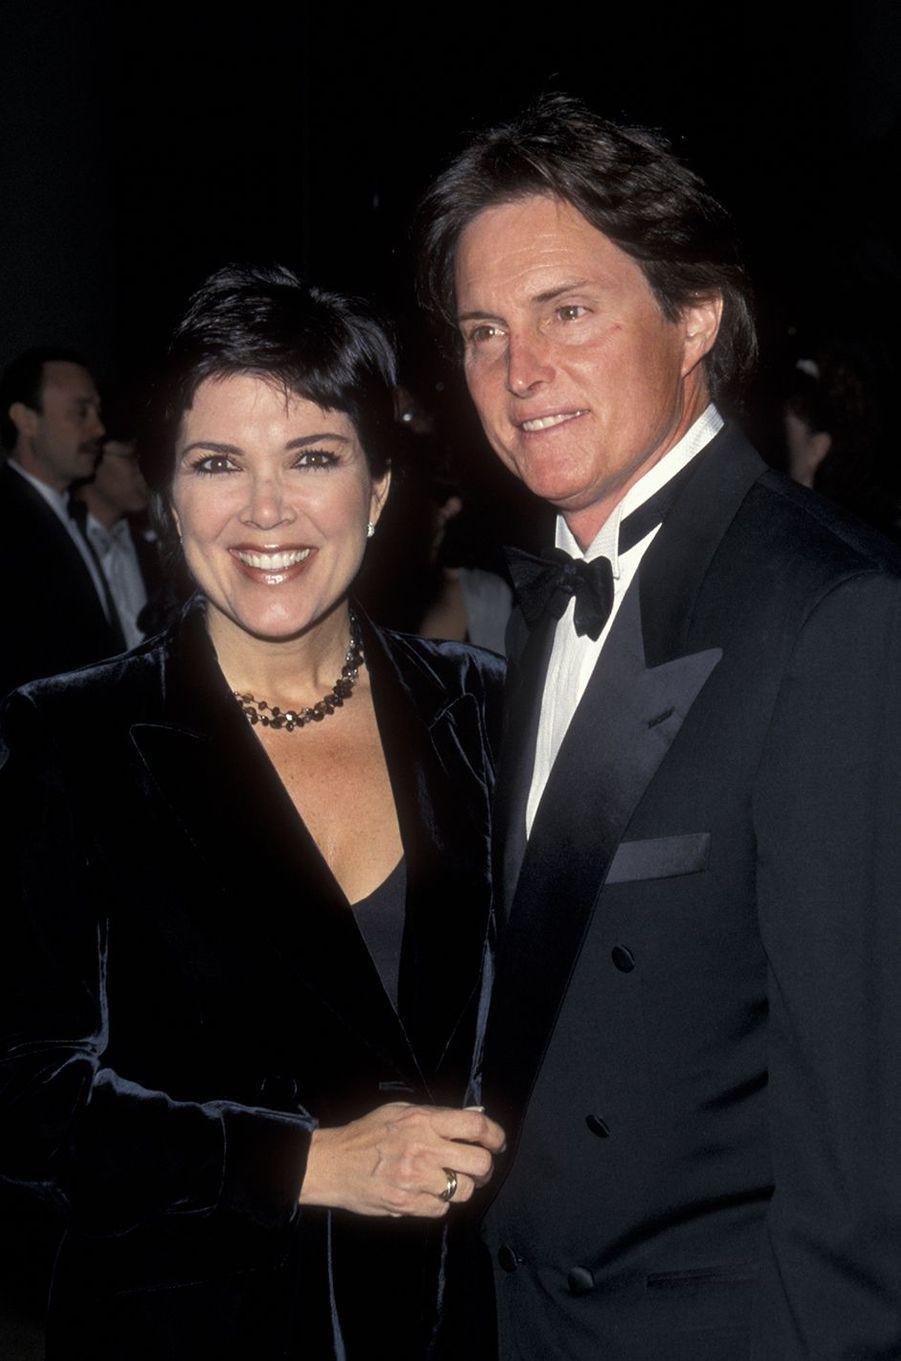 Kris et Bruce Jenner lors d'un gala caritatif à Beverly Hills en mars 1999